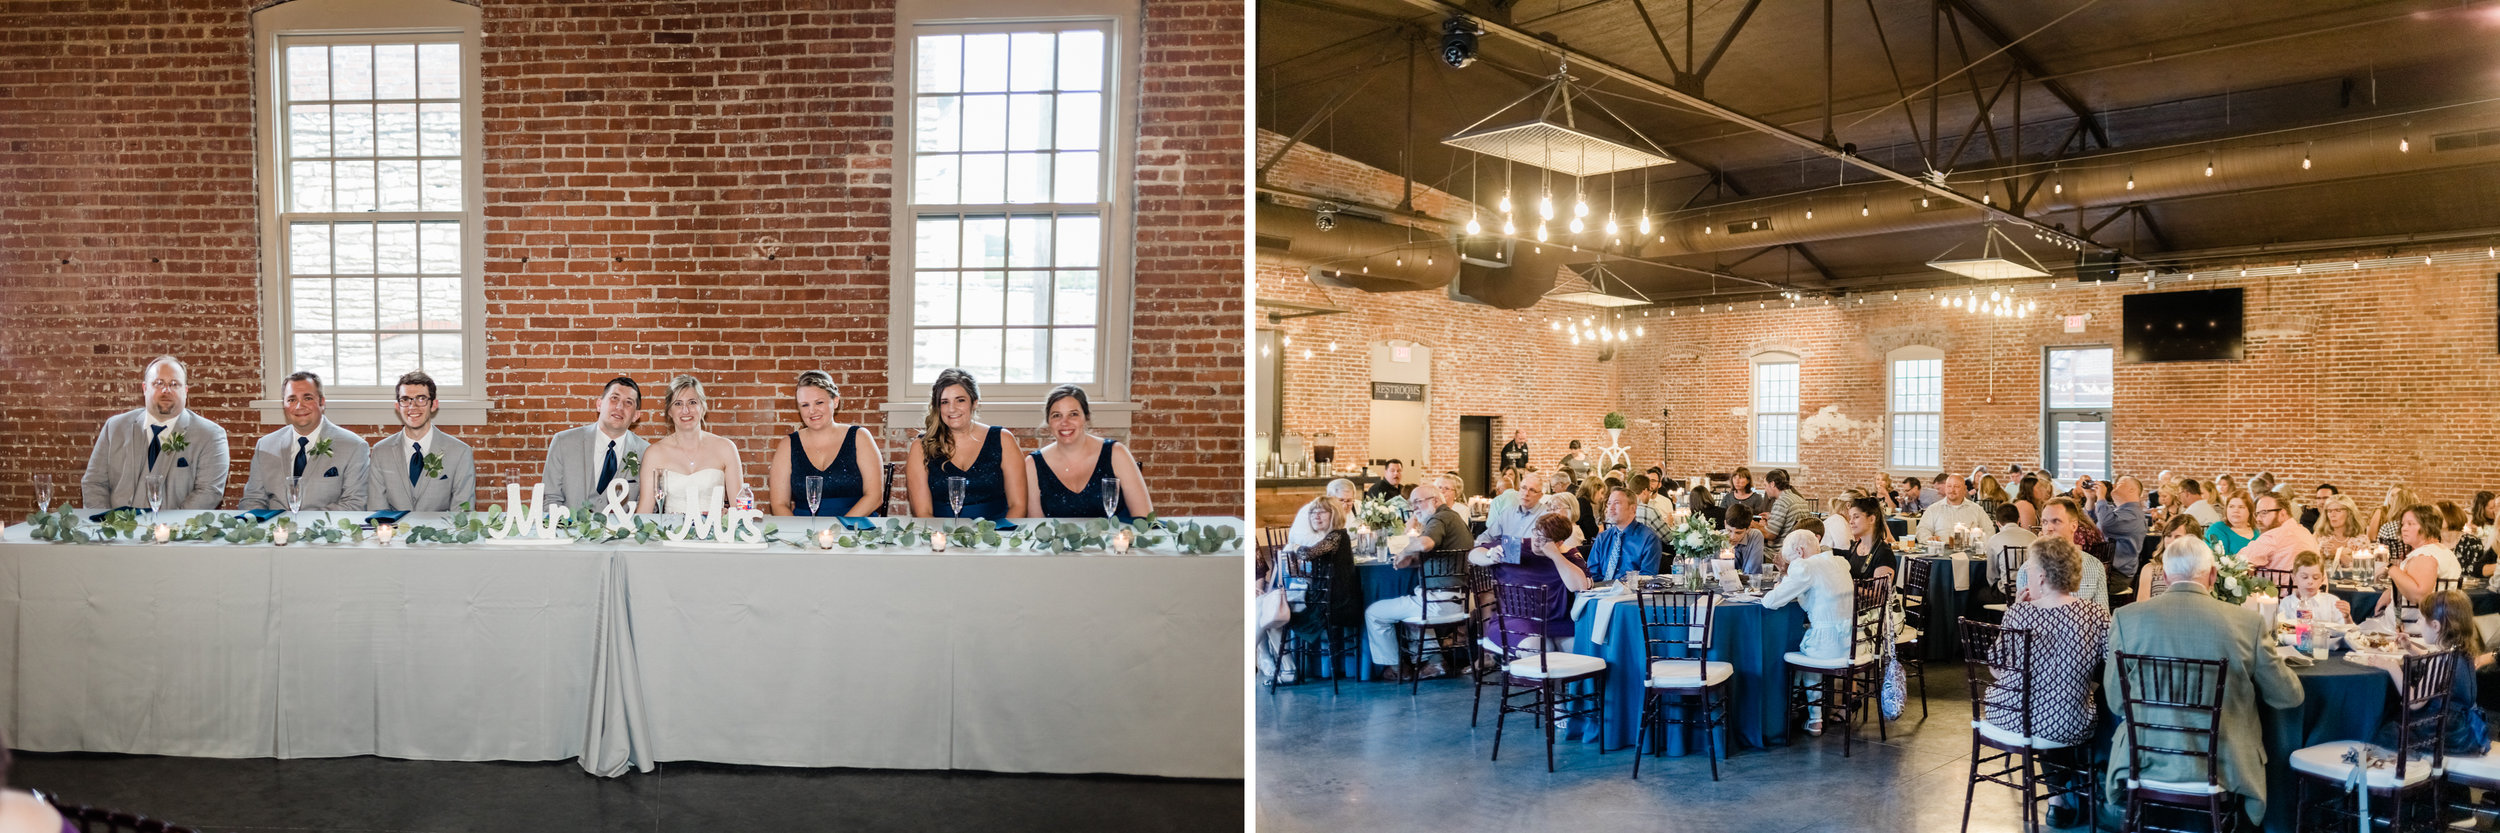 Kansas City Wedding Photographer 10.jpg